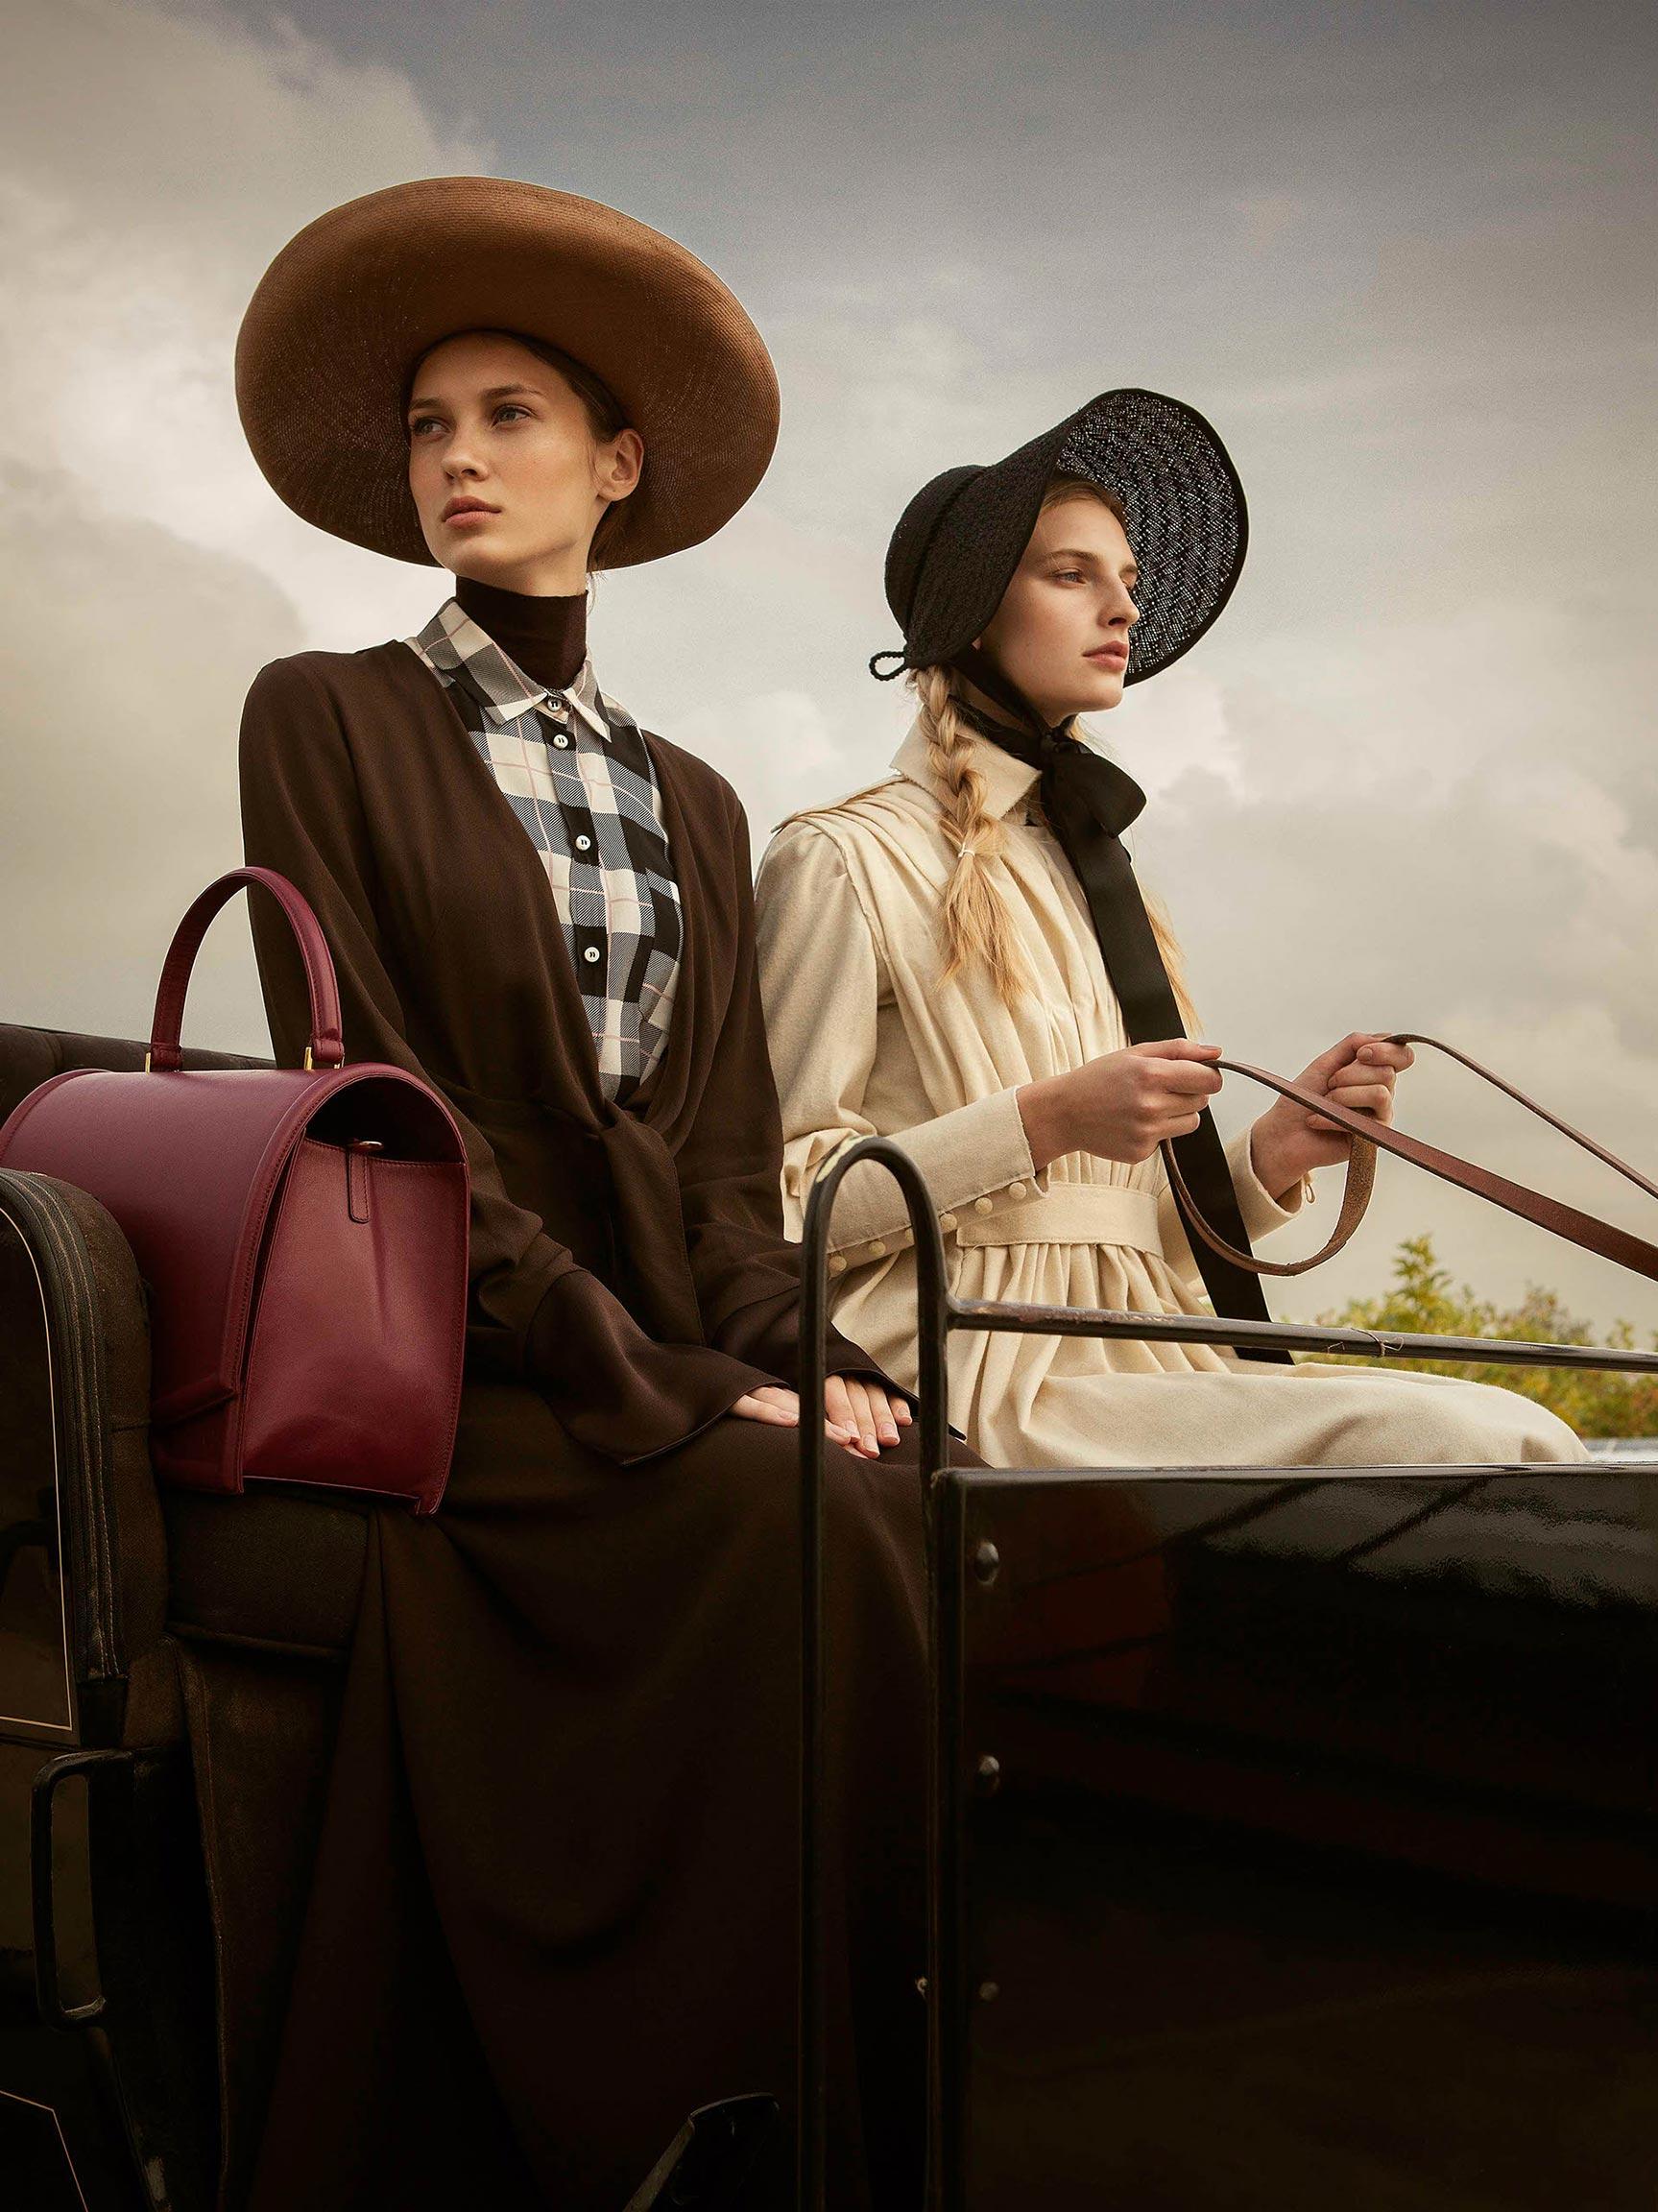 Амиши / Ieva Palionyte and Marie Konor by Santi Esteban / Mujerhoy Magazine